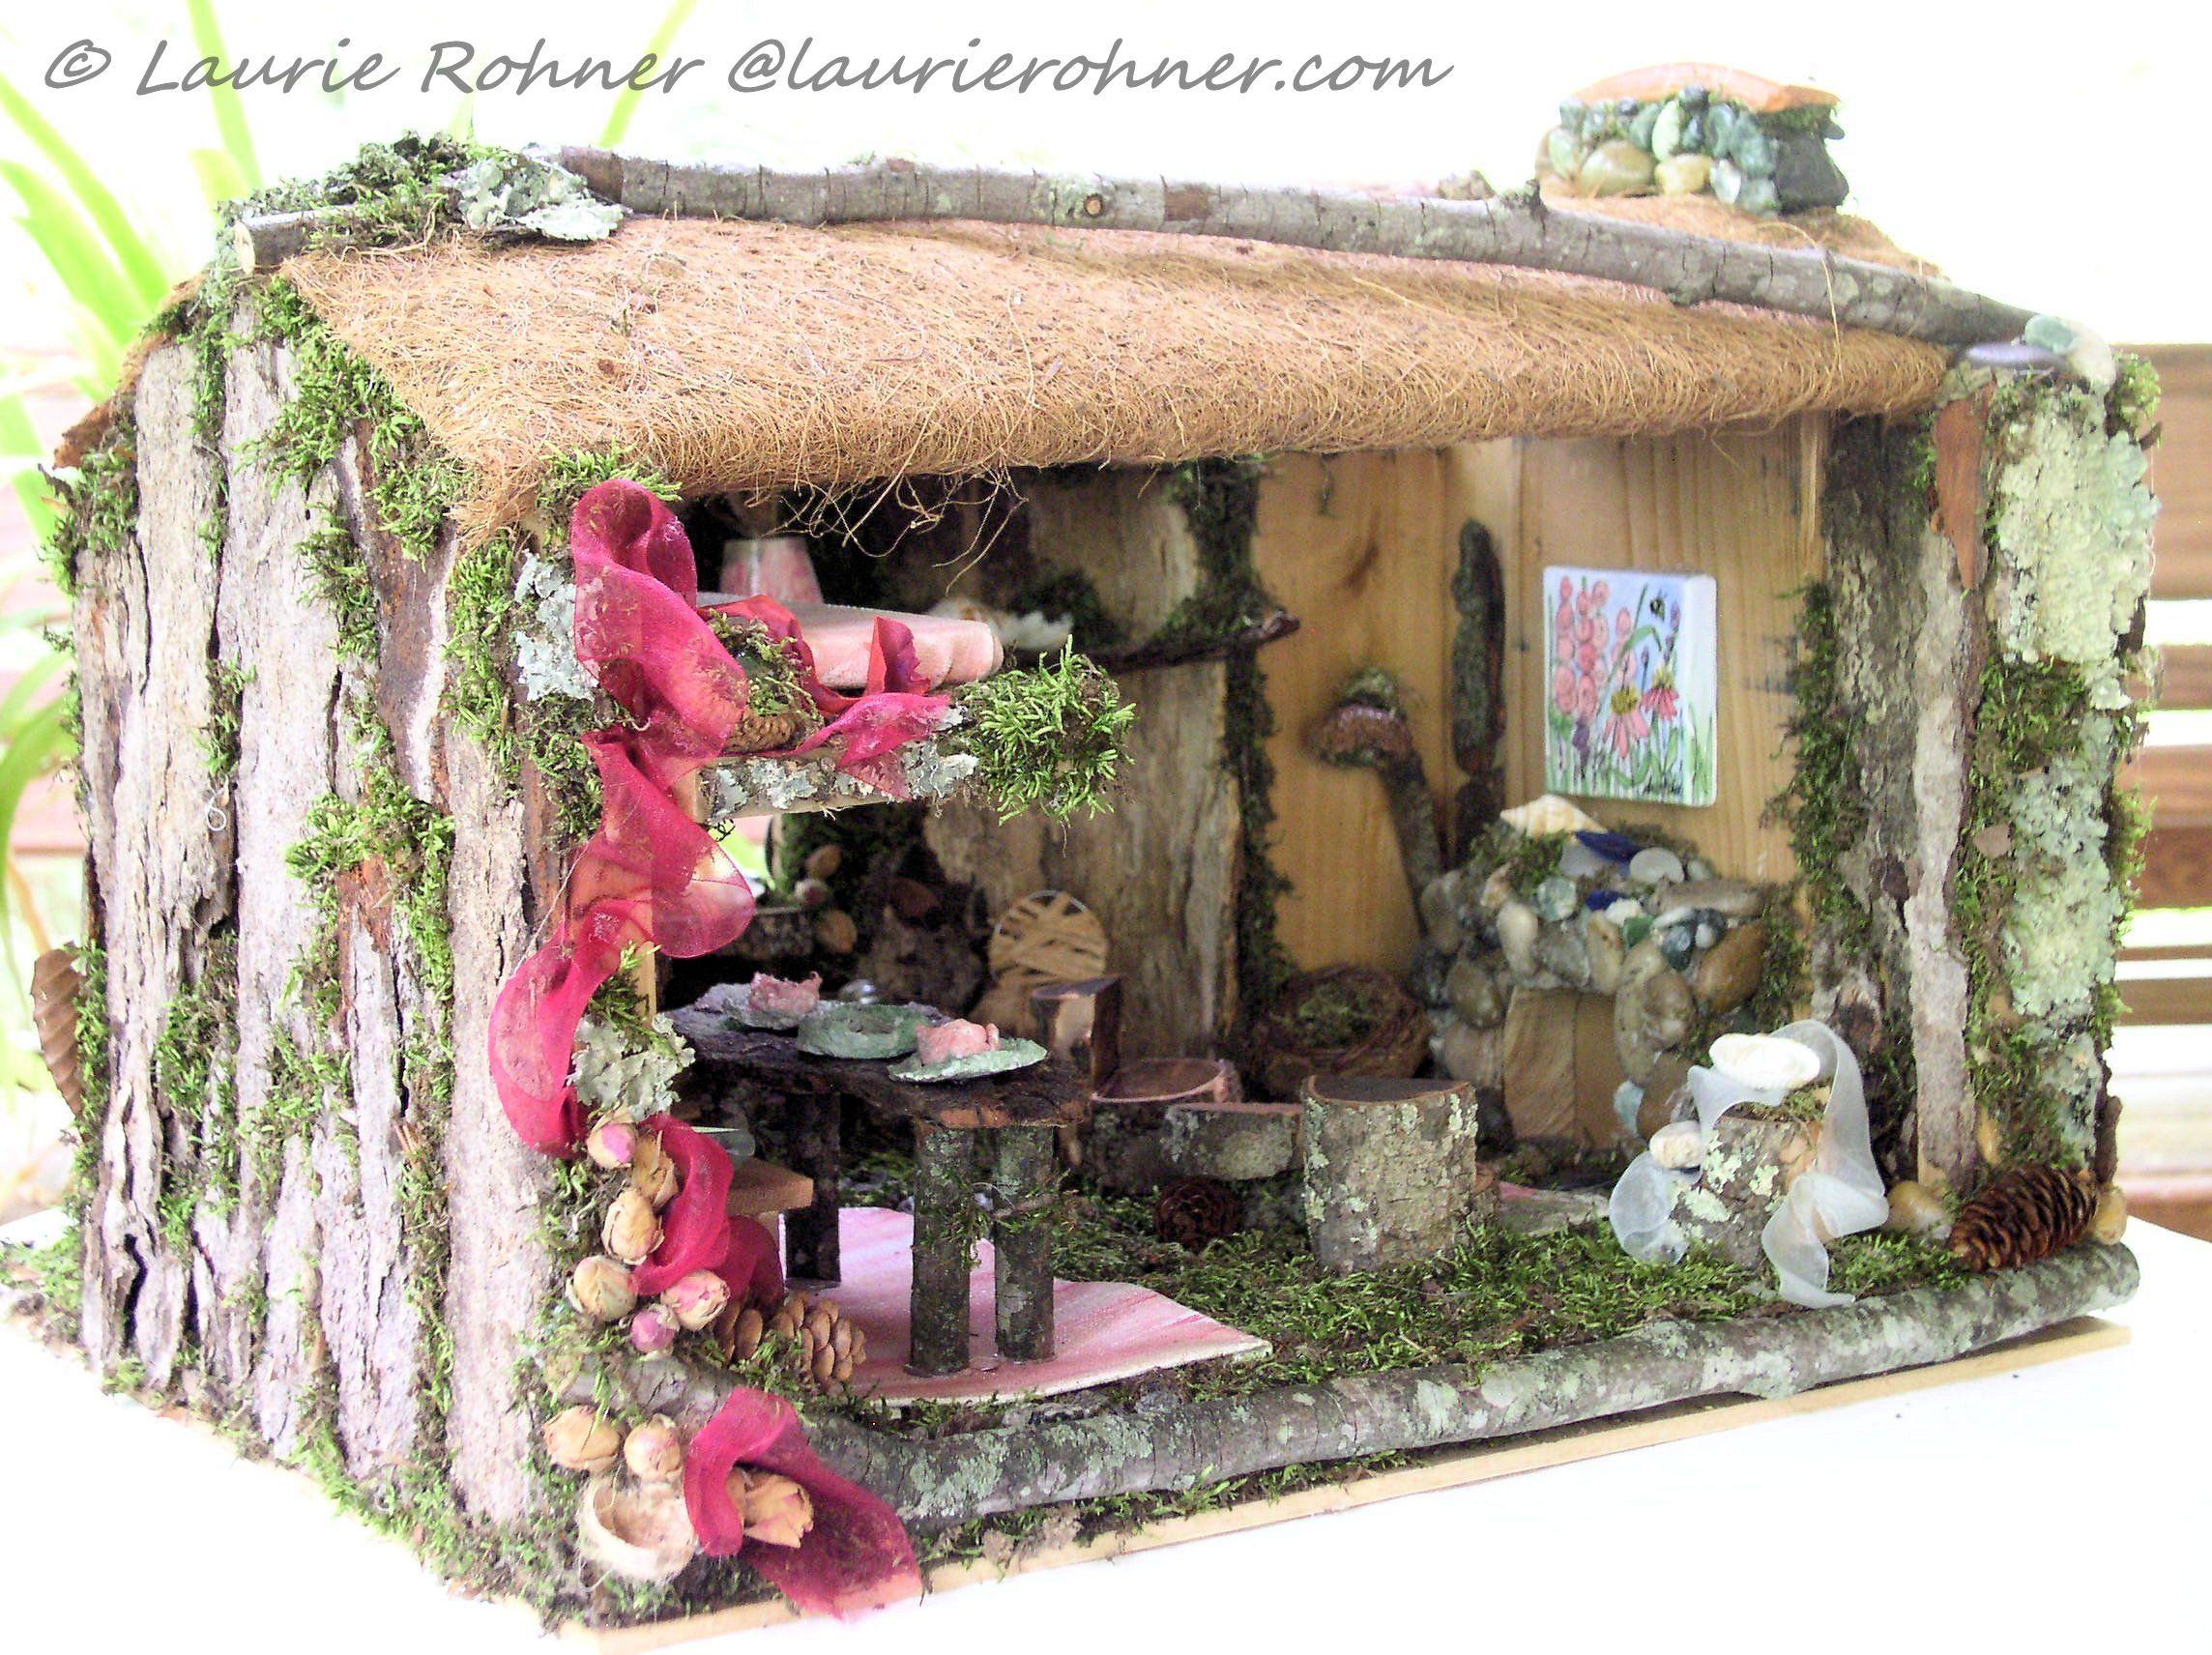 Custom Enchanted Wood Fairy House - Laurie Rohner Studio